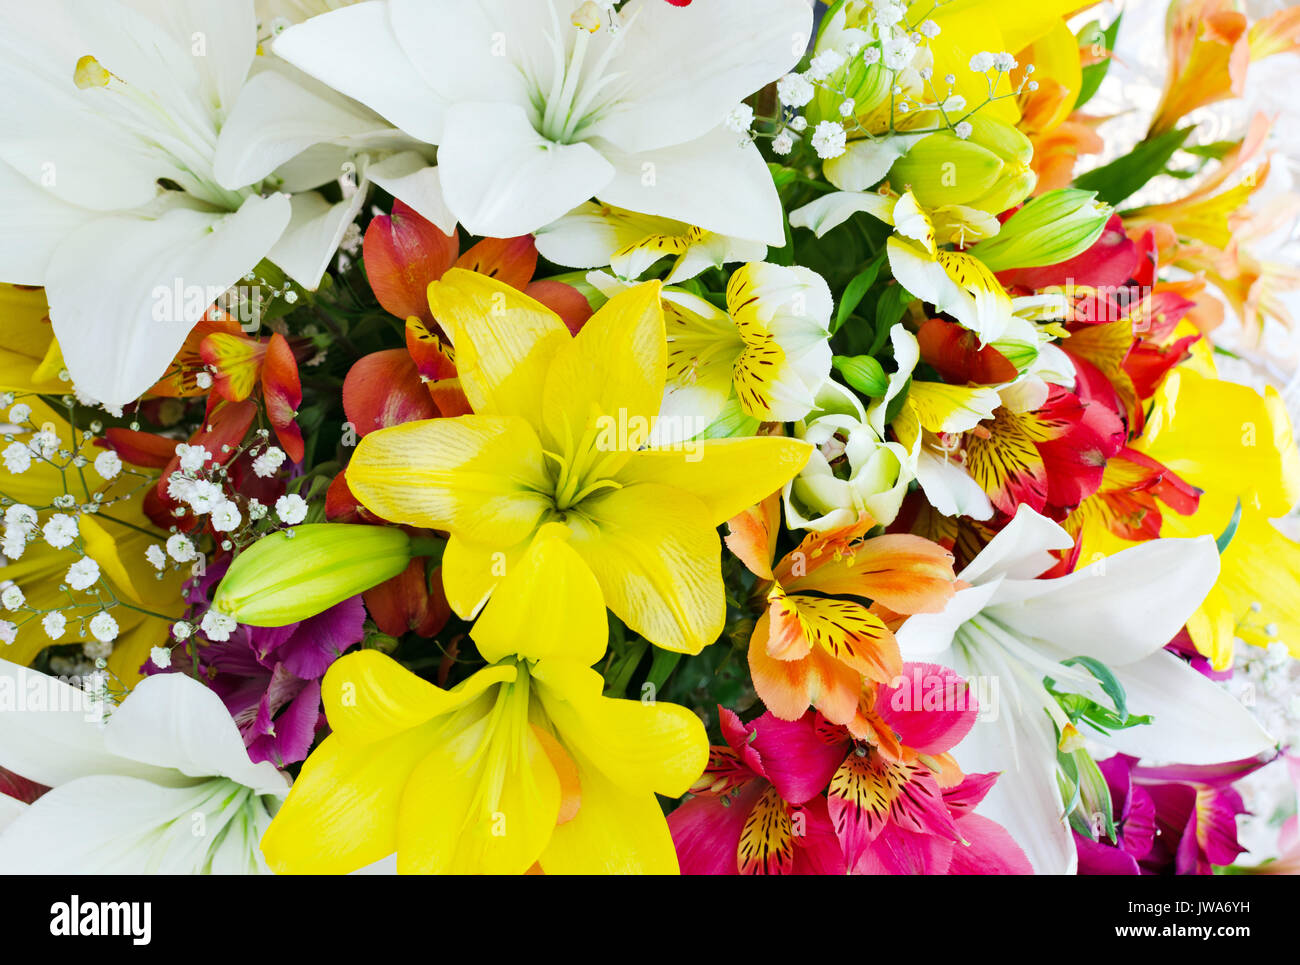 Pattern of different flowers in bouquet stock photo 153274341 alamy pattern of different flowers in bouquet izmirmasajfo